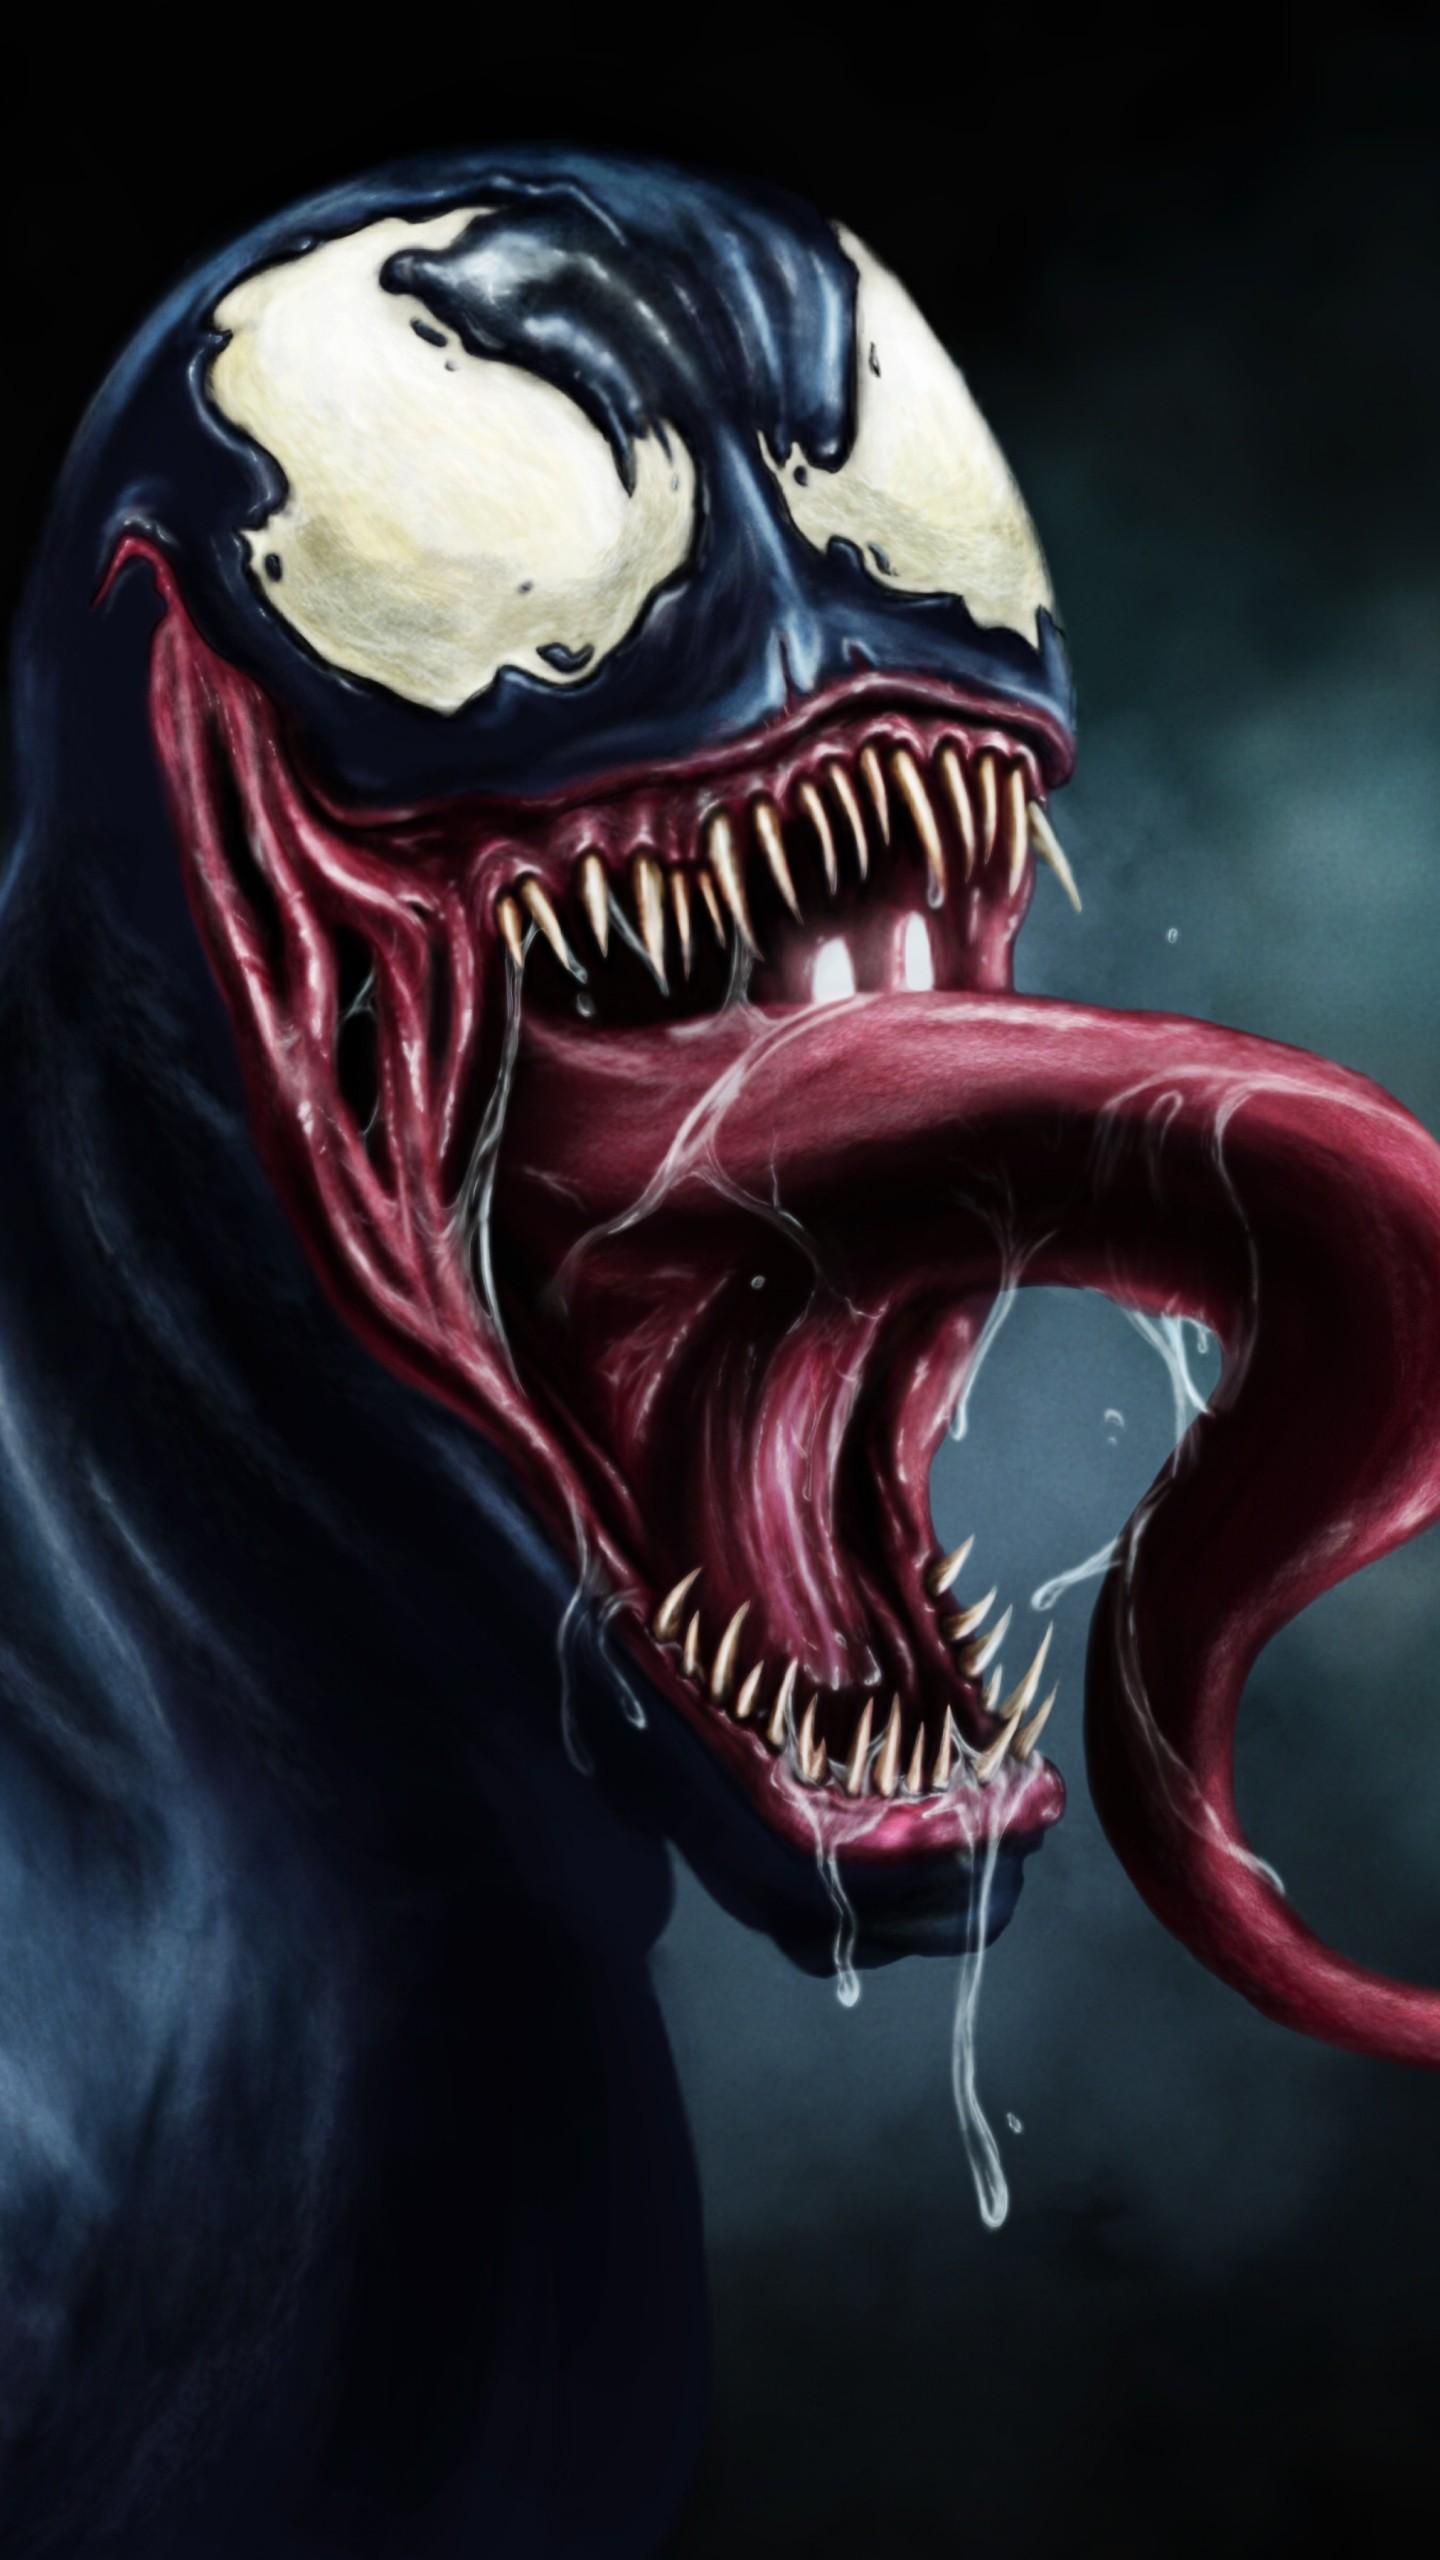 Wallpaper venom, eddie brock, marvel